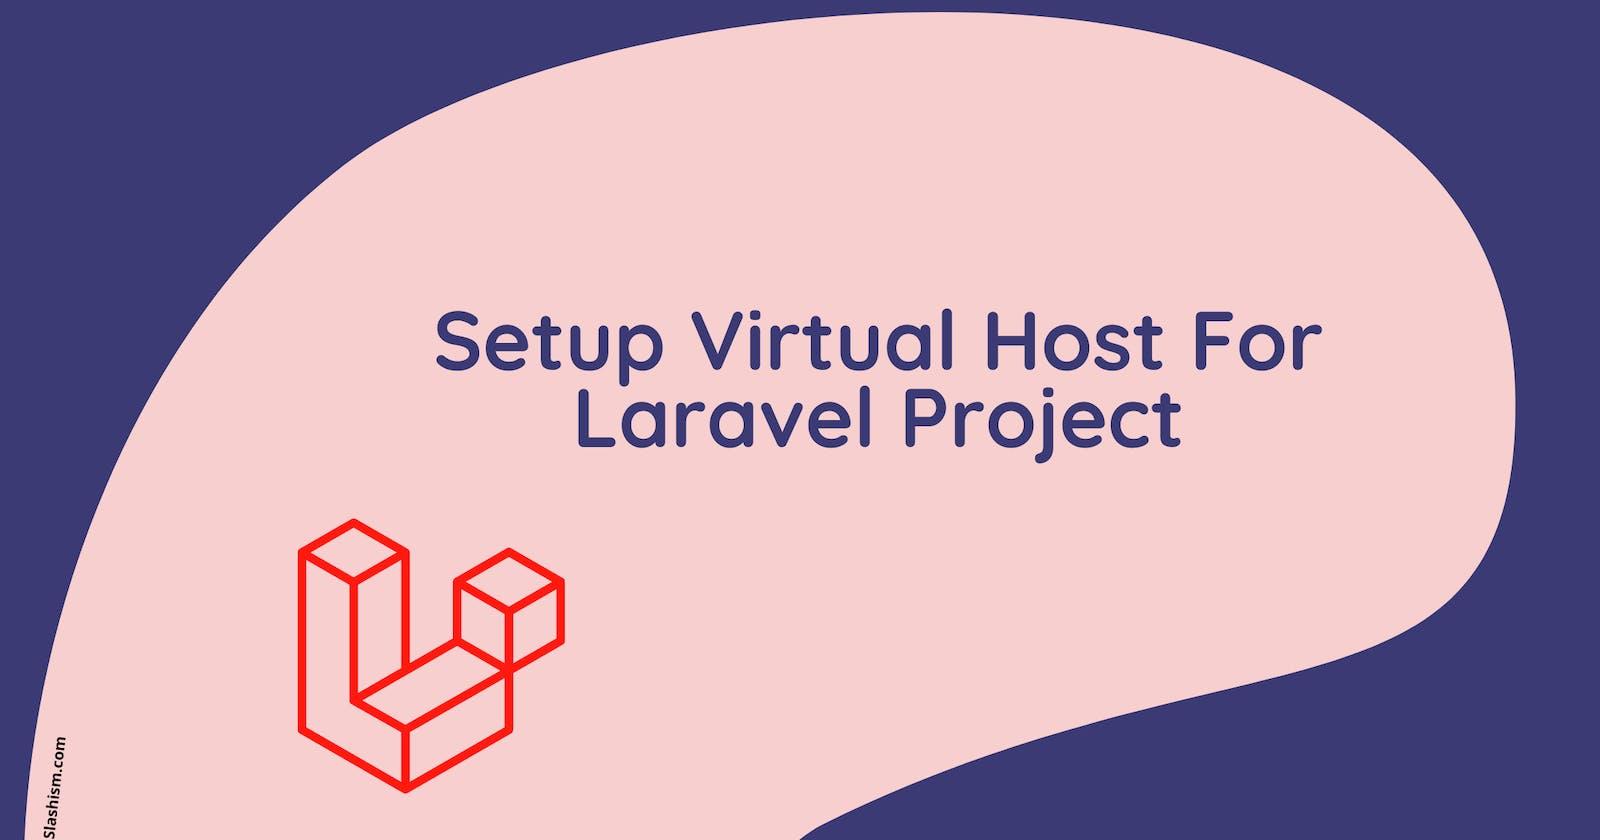 Setup Virtual Host For Laravel Project